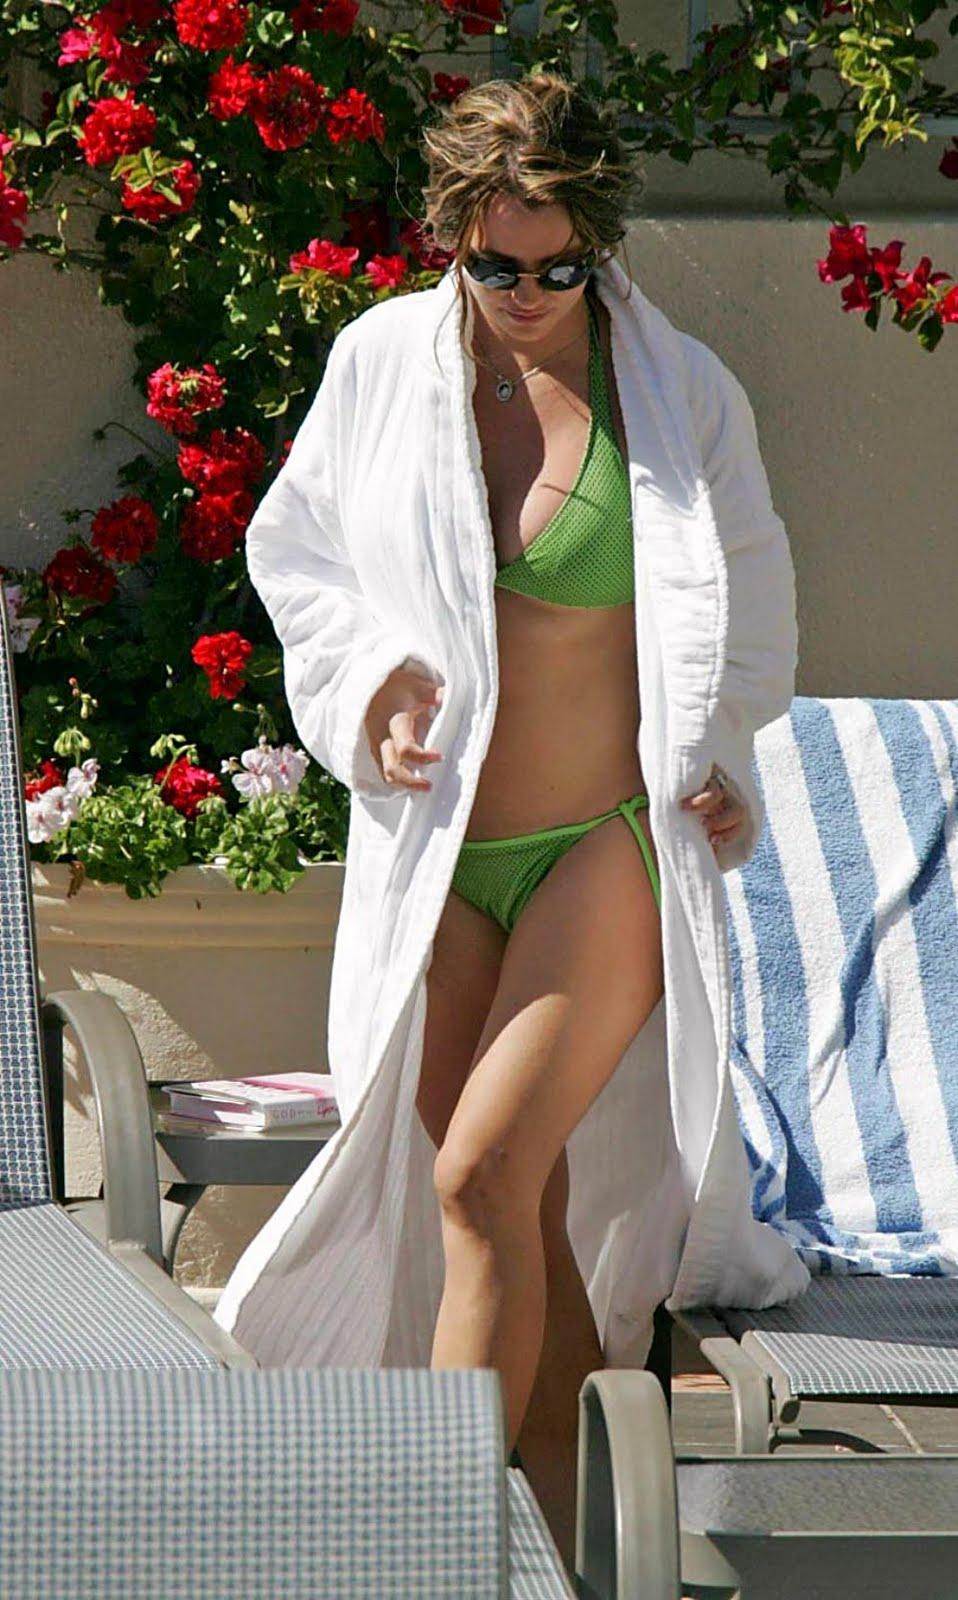 britney spears hot thong bikini green Meat Insertions